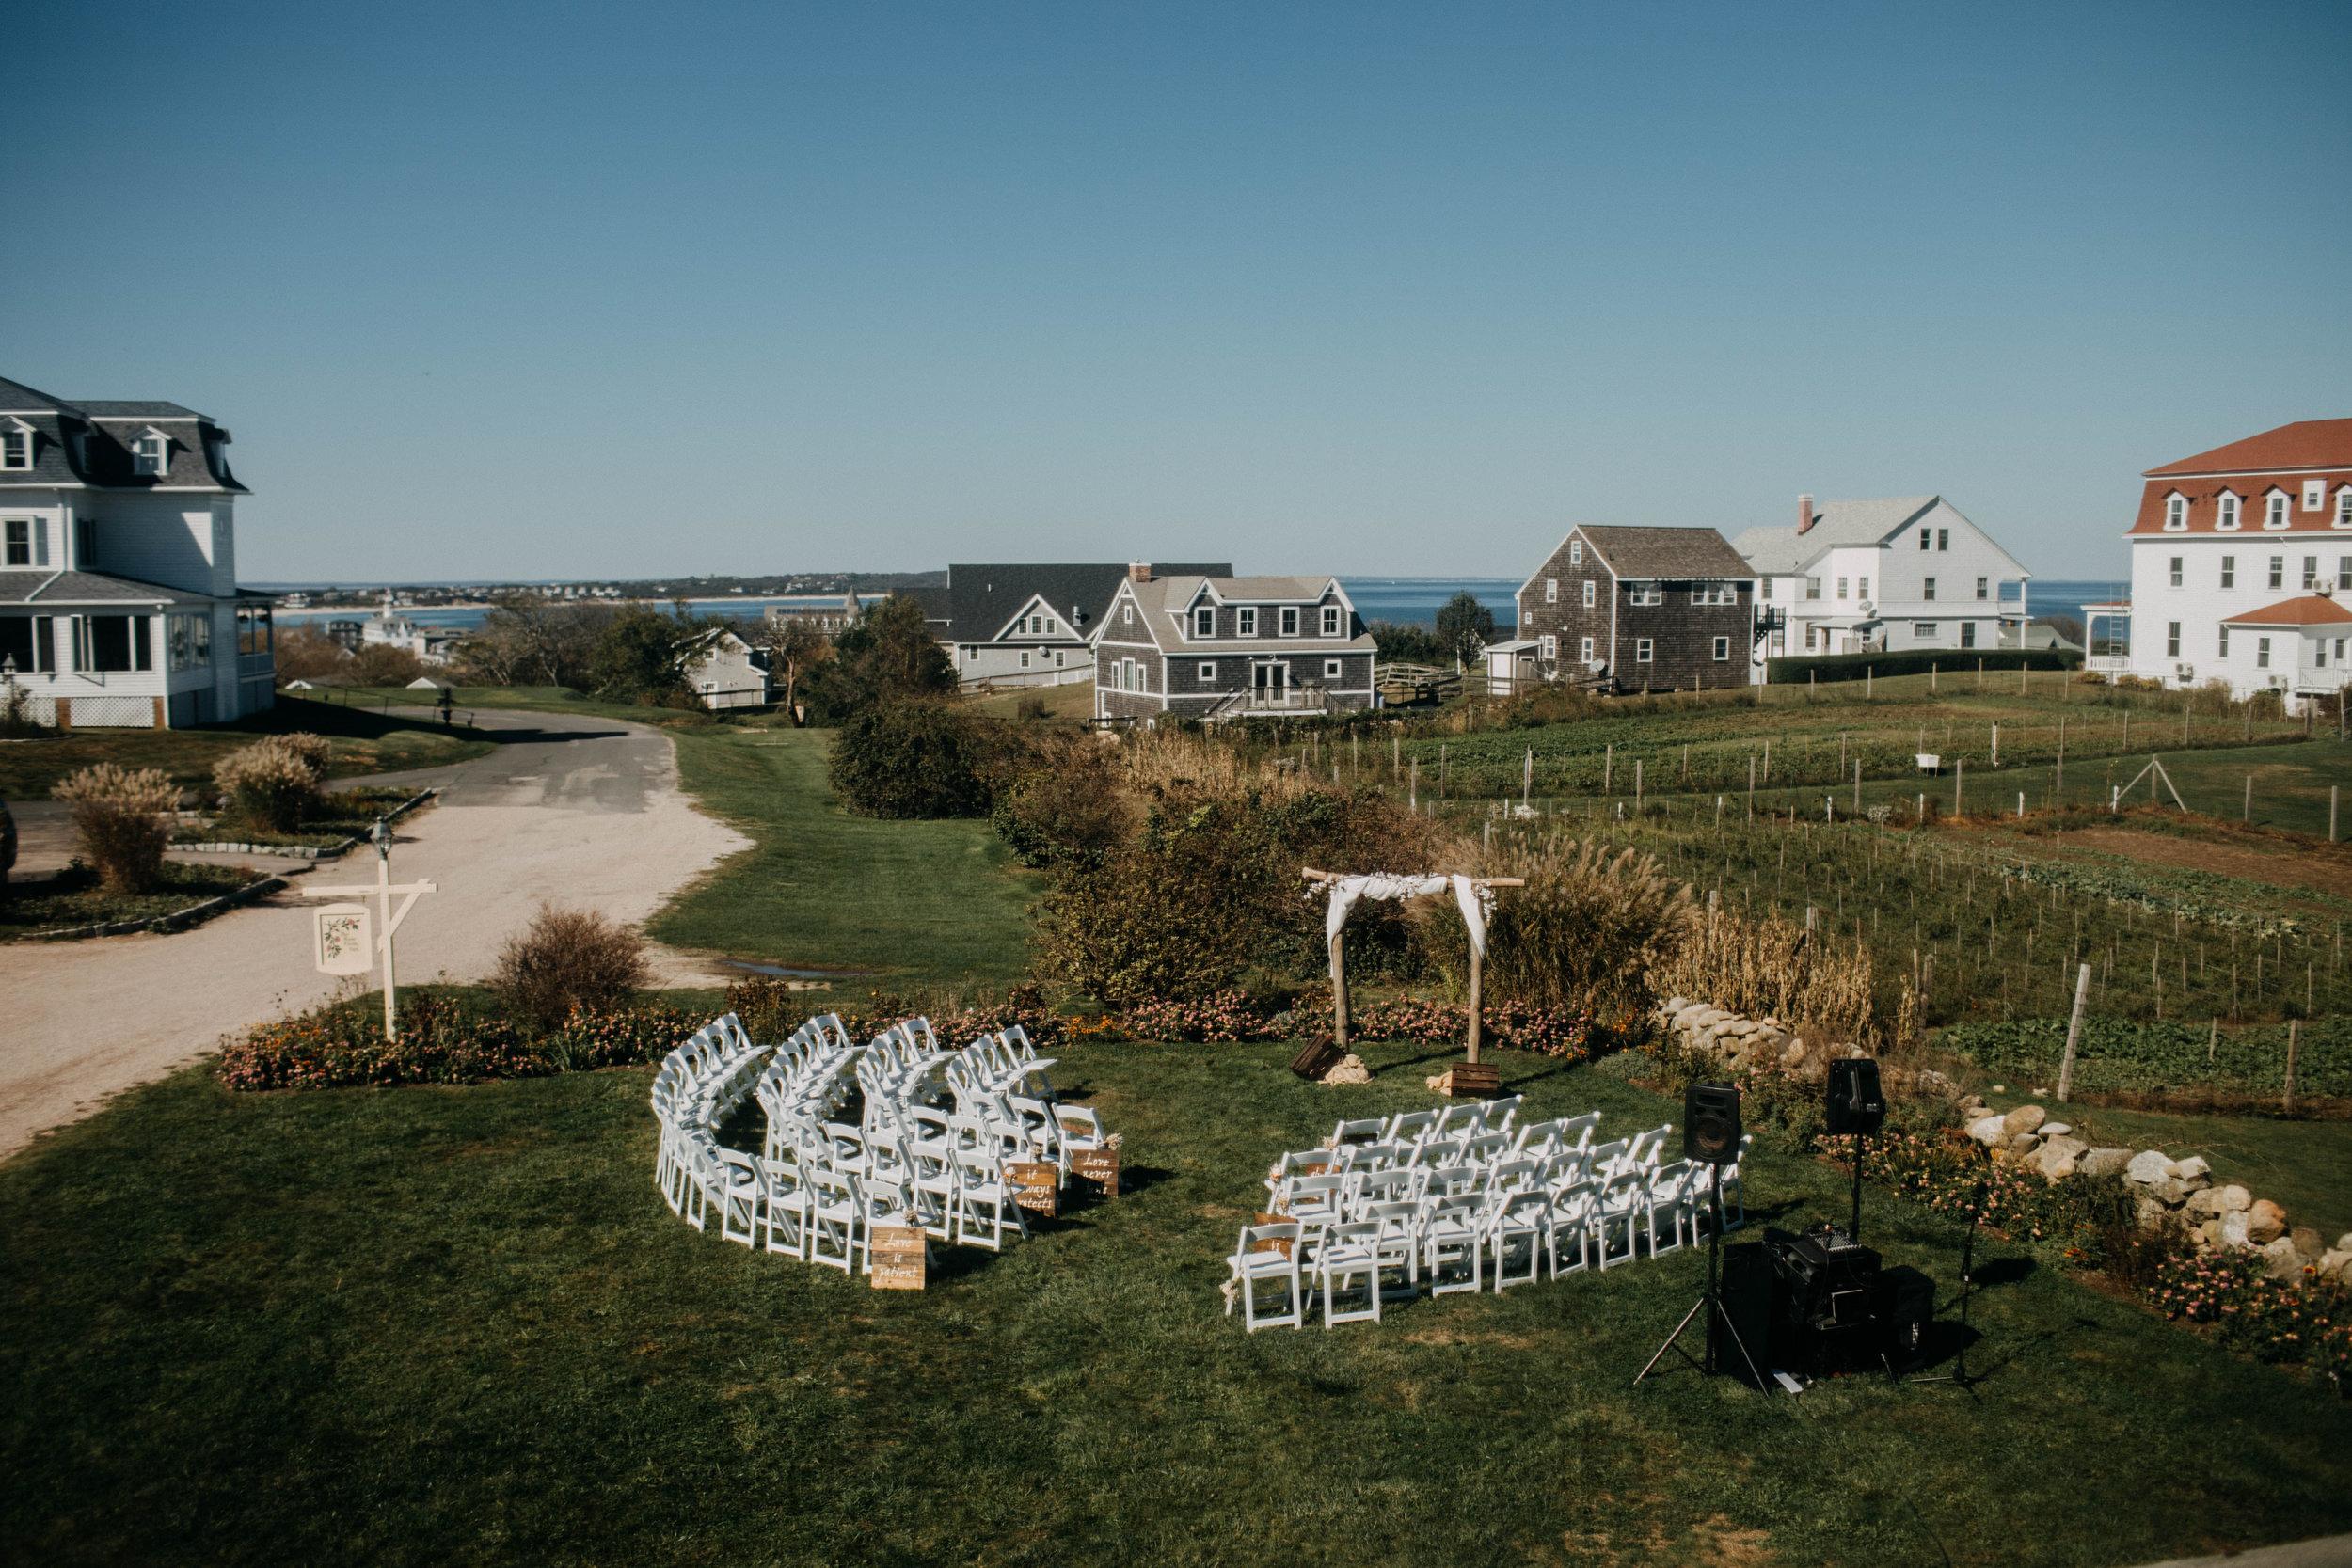 intimate block island rhode island wedding rose farm inn wedding east coast wedding photographer186.jpg